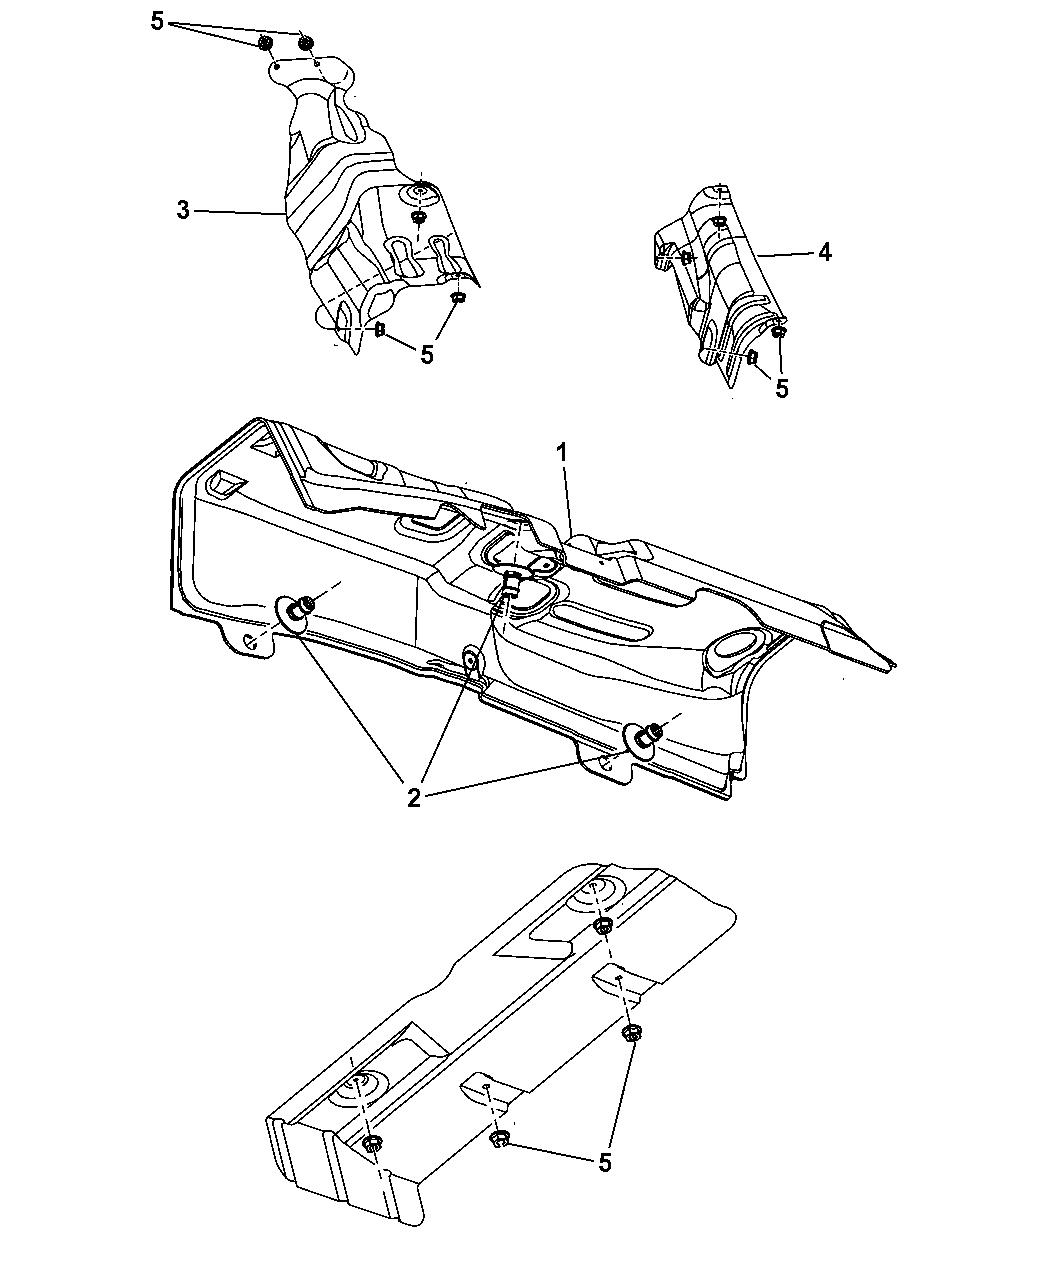 2010 dodge caliber exhaust system heat shield